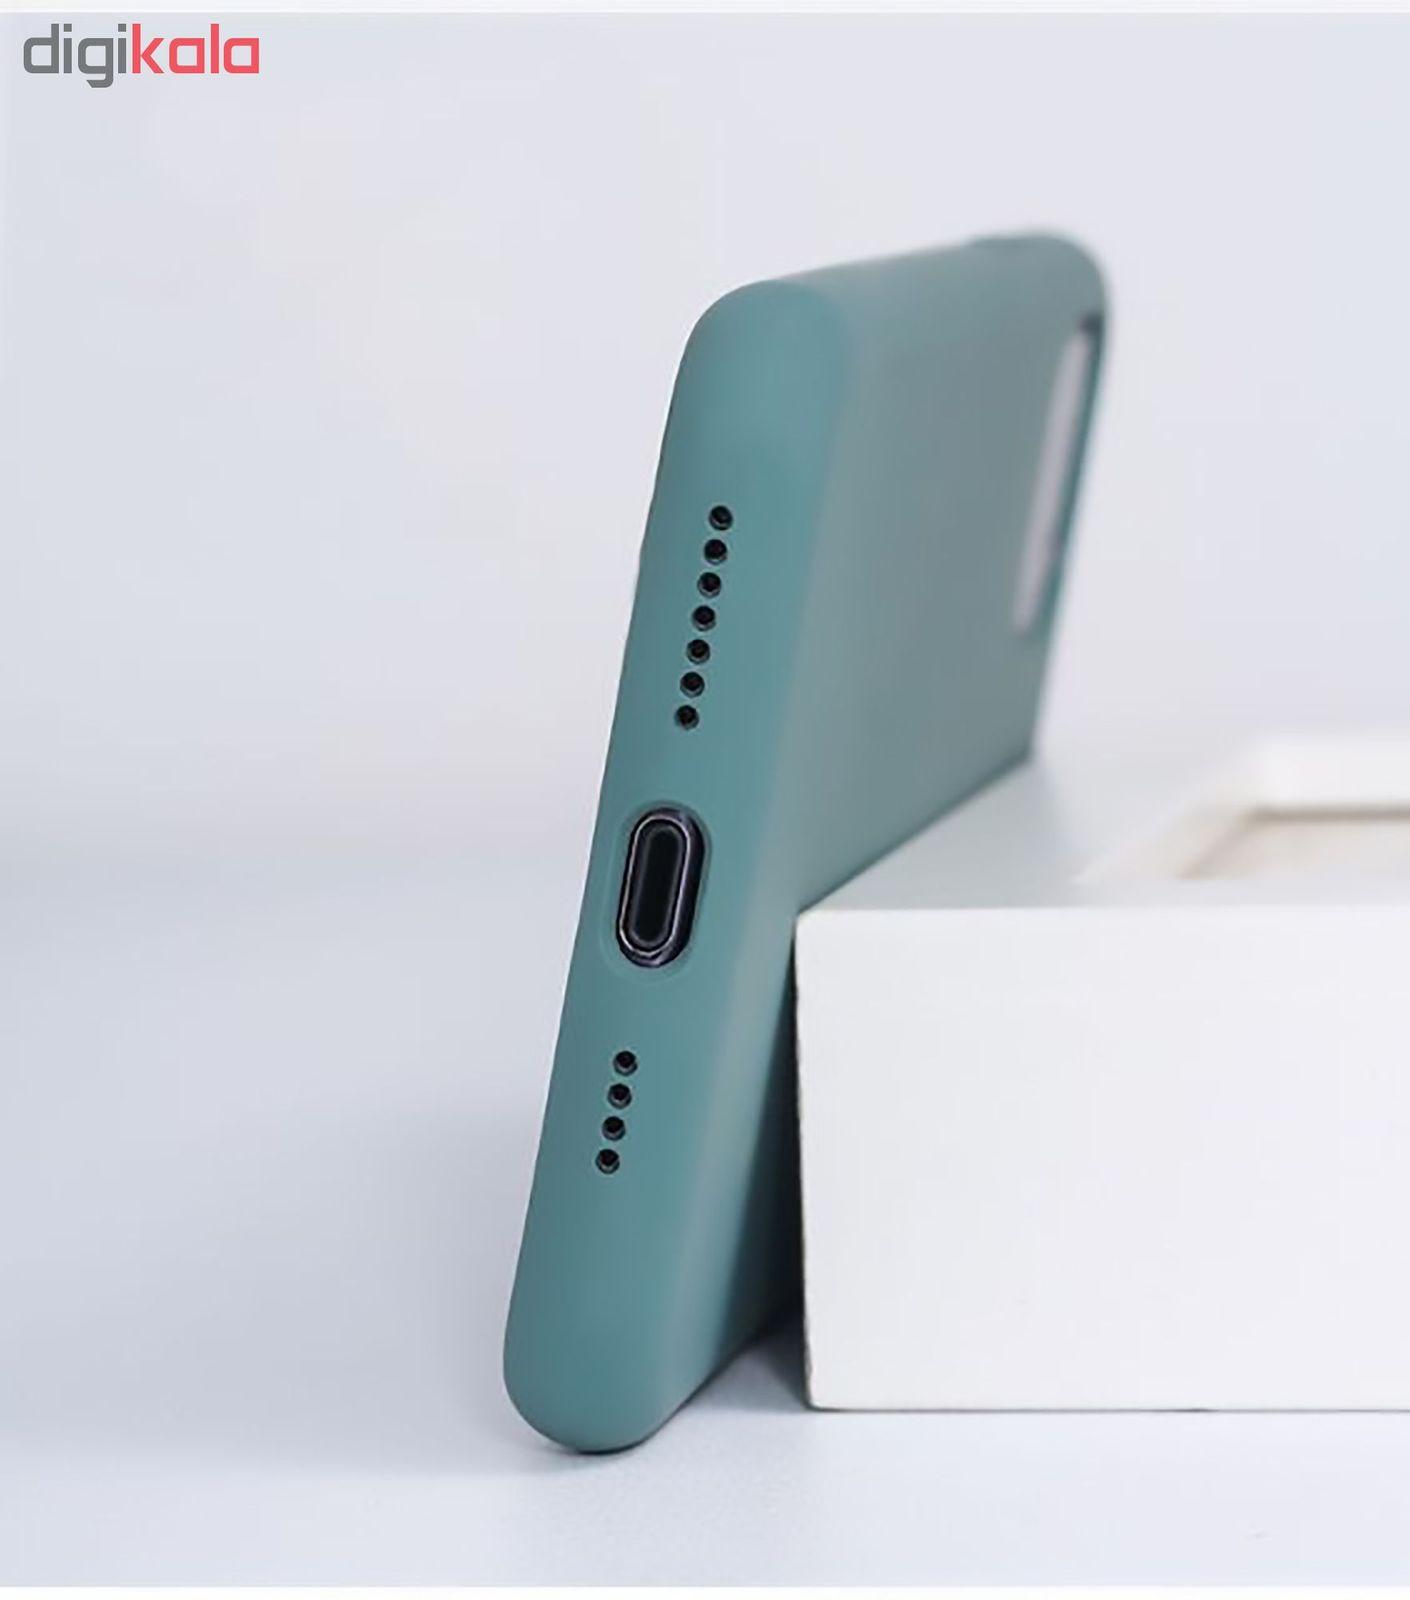 کاور مدل Silc مناسب برای گوشی موبایل اپل  Iphone 8 plus / iphone 7plus main 1 12